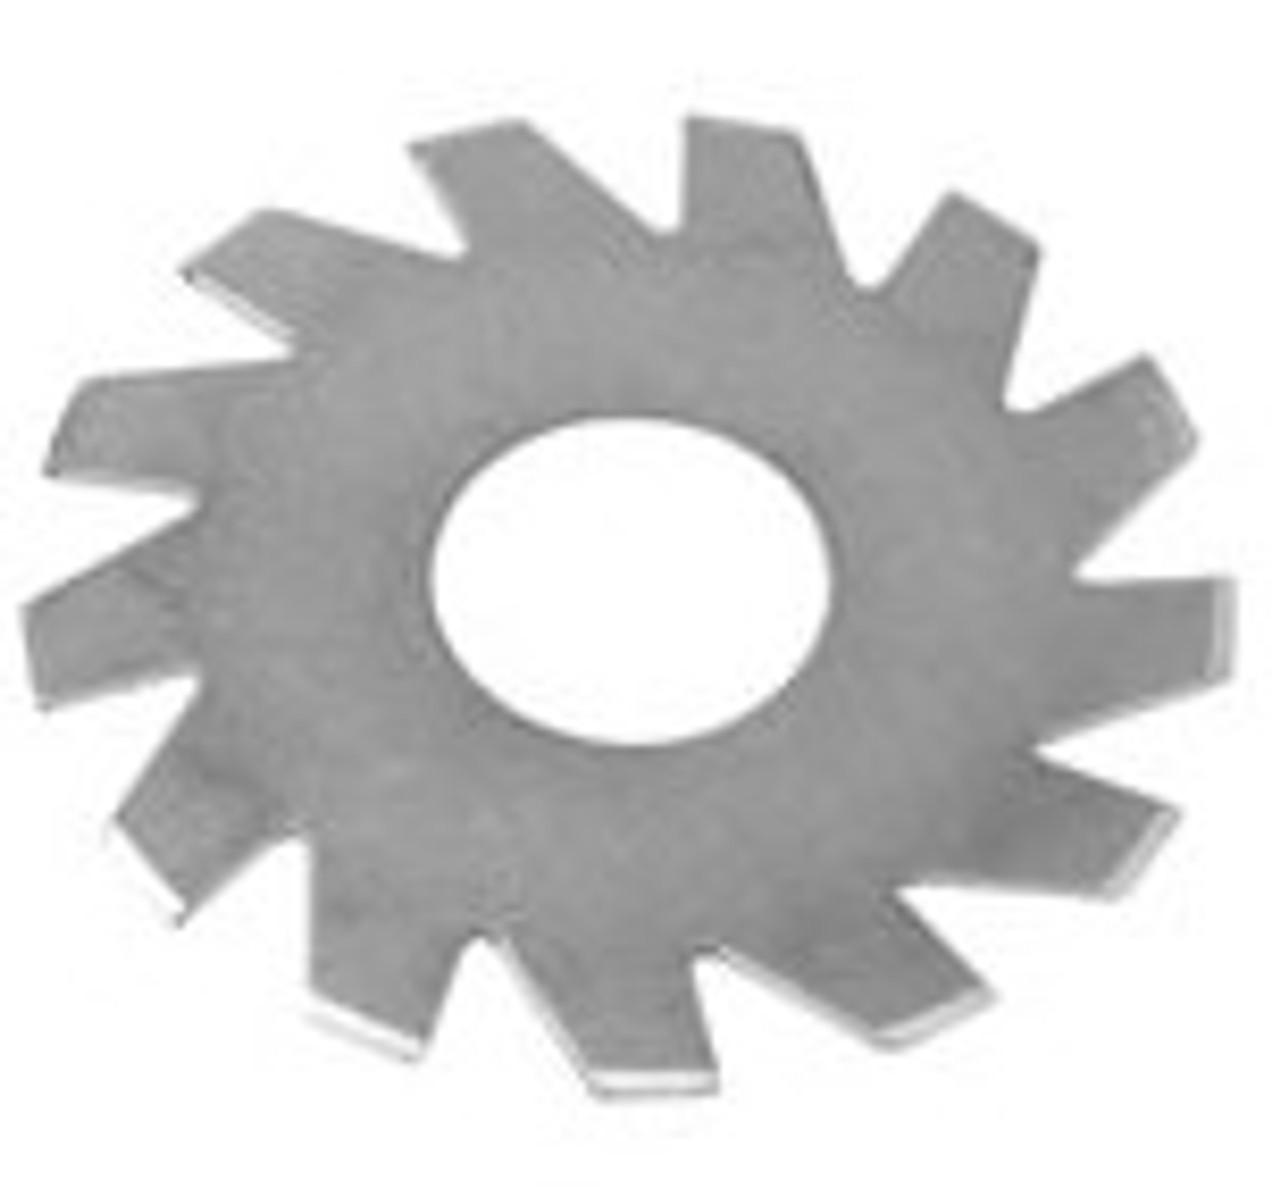 Hobart Standard Replacement Tenderizer Blades - HT110